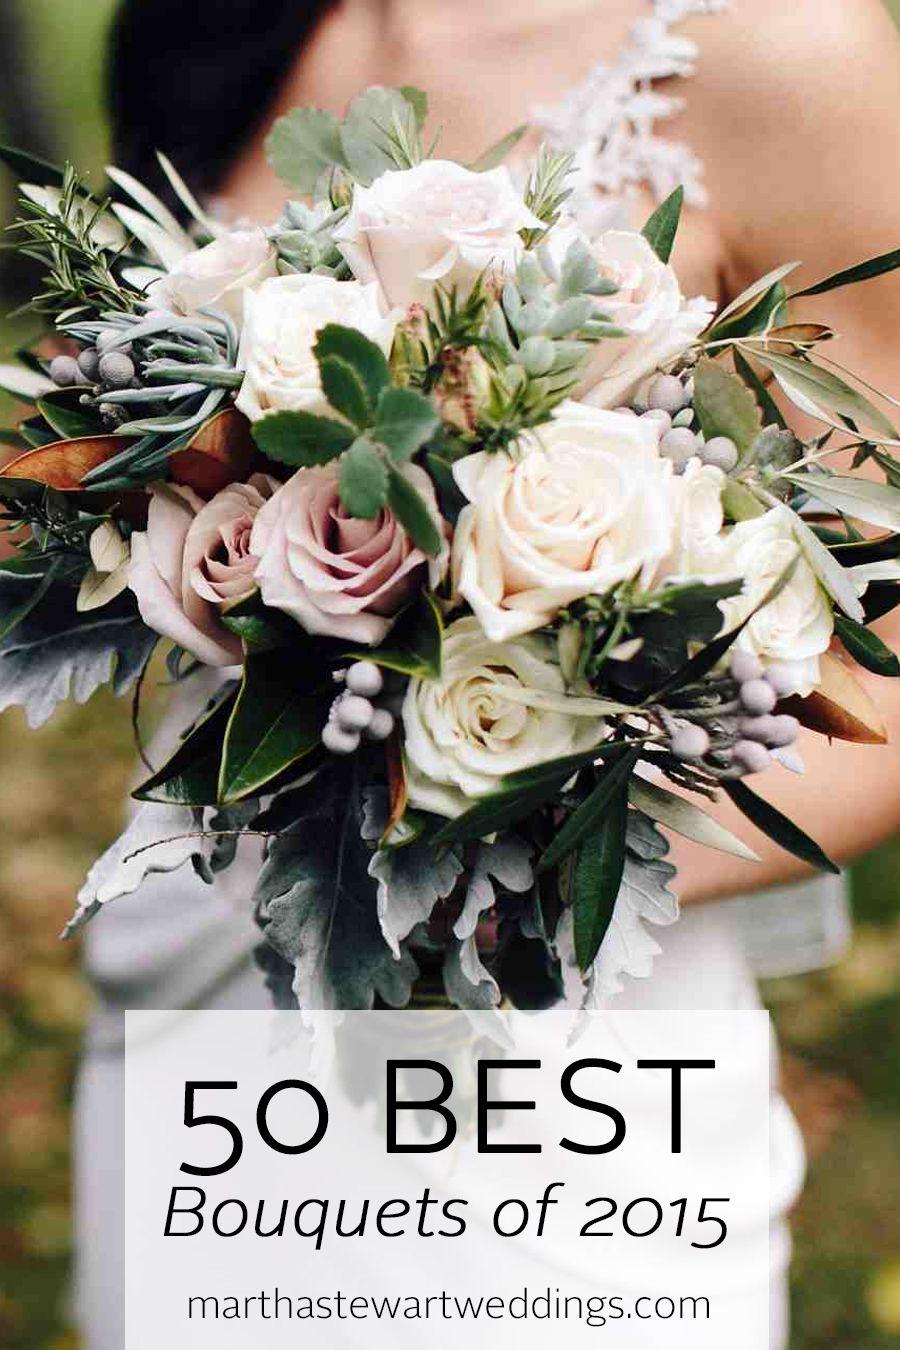 The 50 Best Wedding Bouquets Pinterest Martha Stewart Weddings